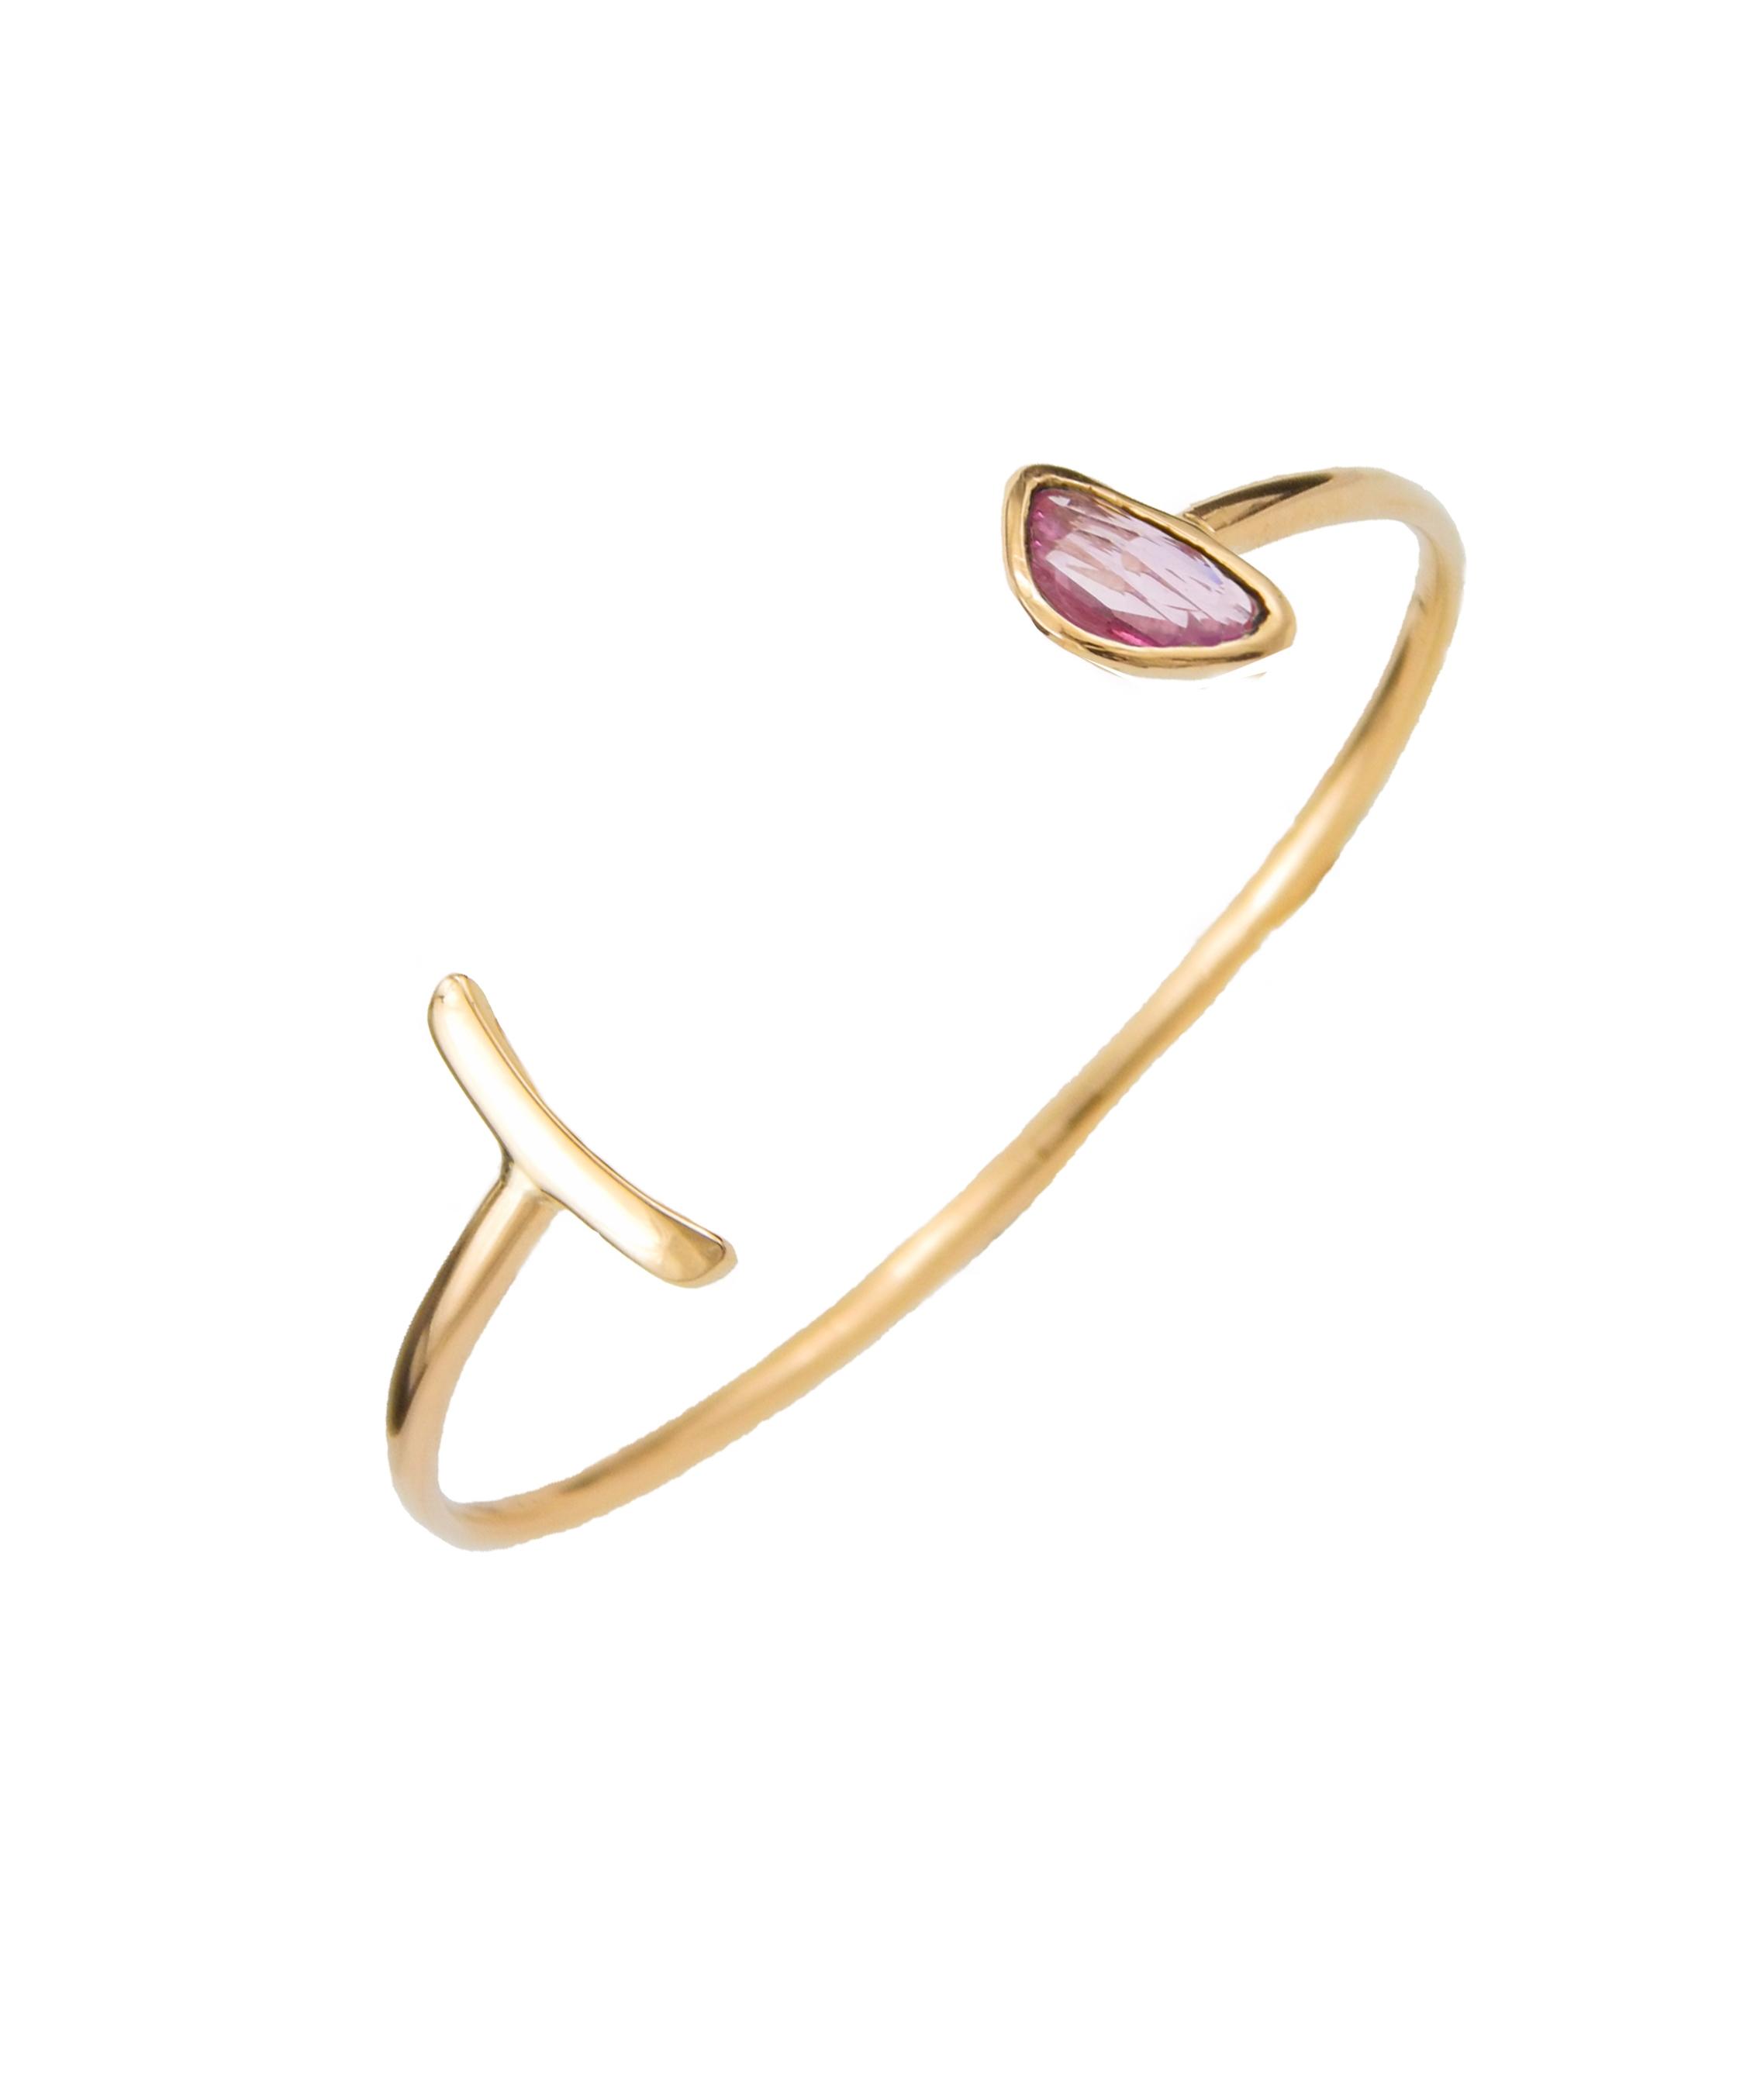 STANIS Bangle pink sapphire 1-18 carat gold nomad inside.jpg